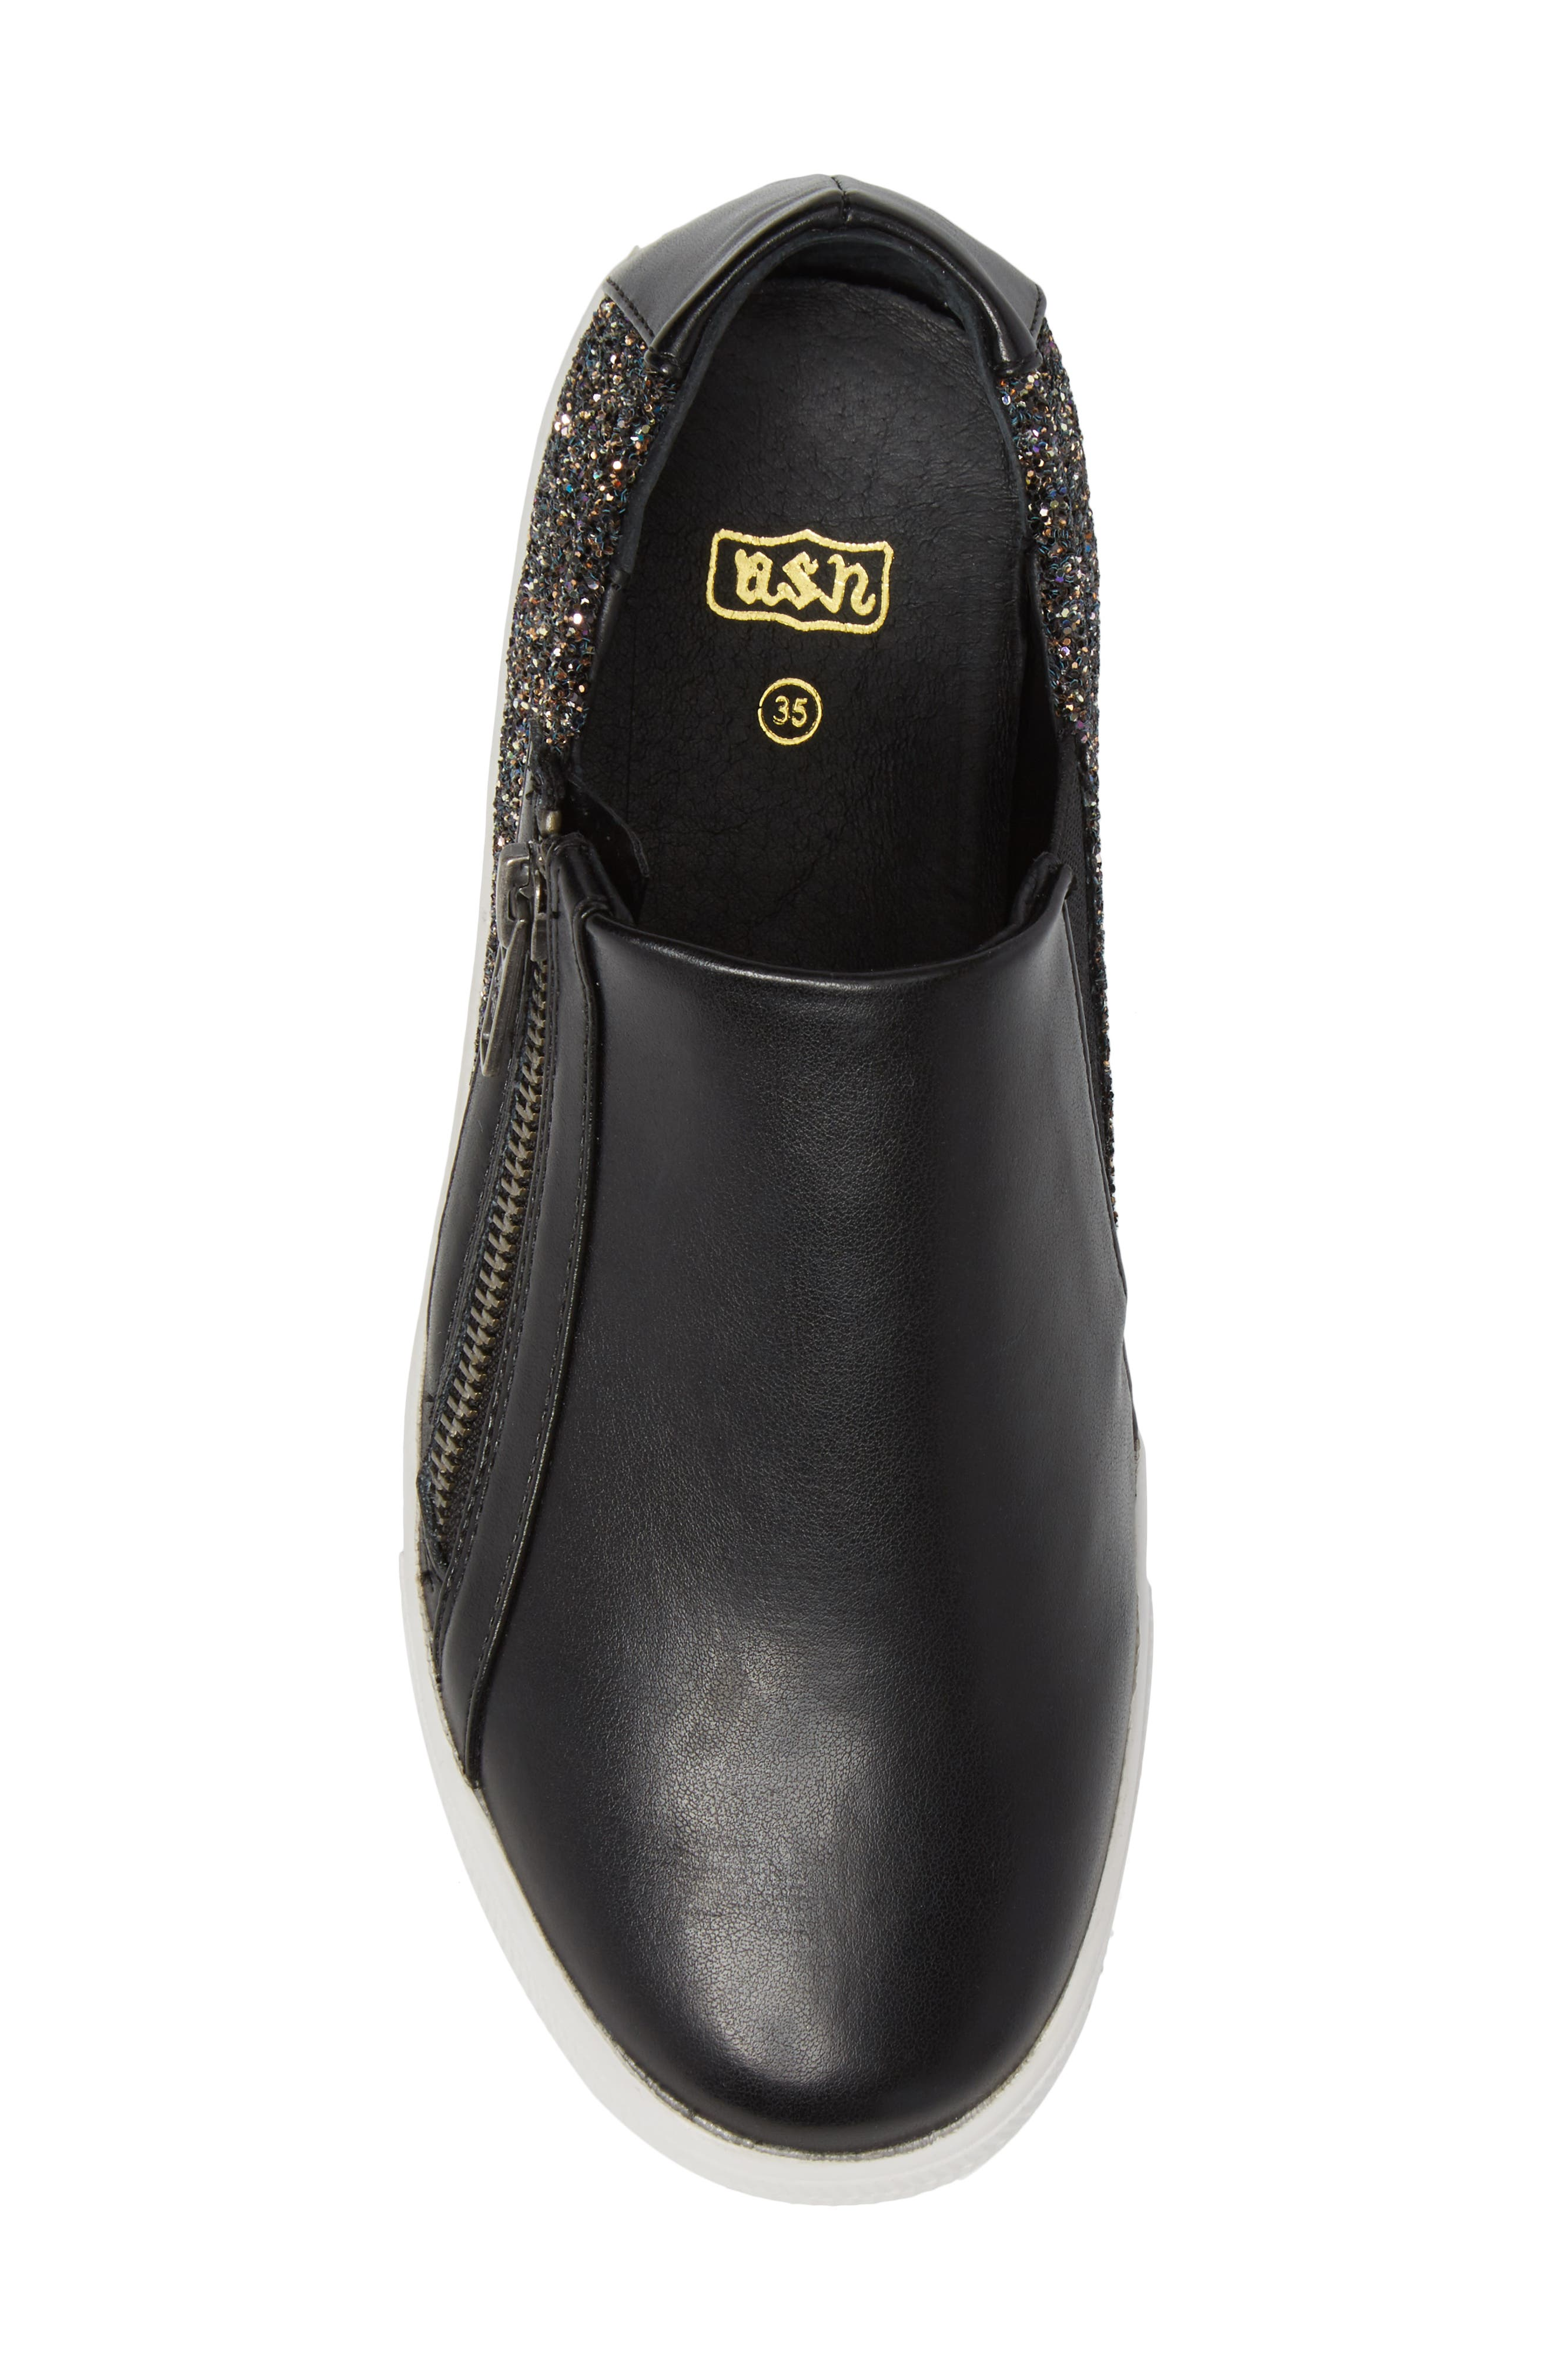 Lynn Monica Glittery Zip Sneaker,                             Alternate thumbnail 5, color,                             Black Faux Leather